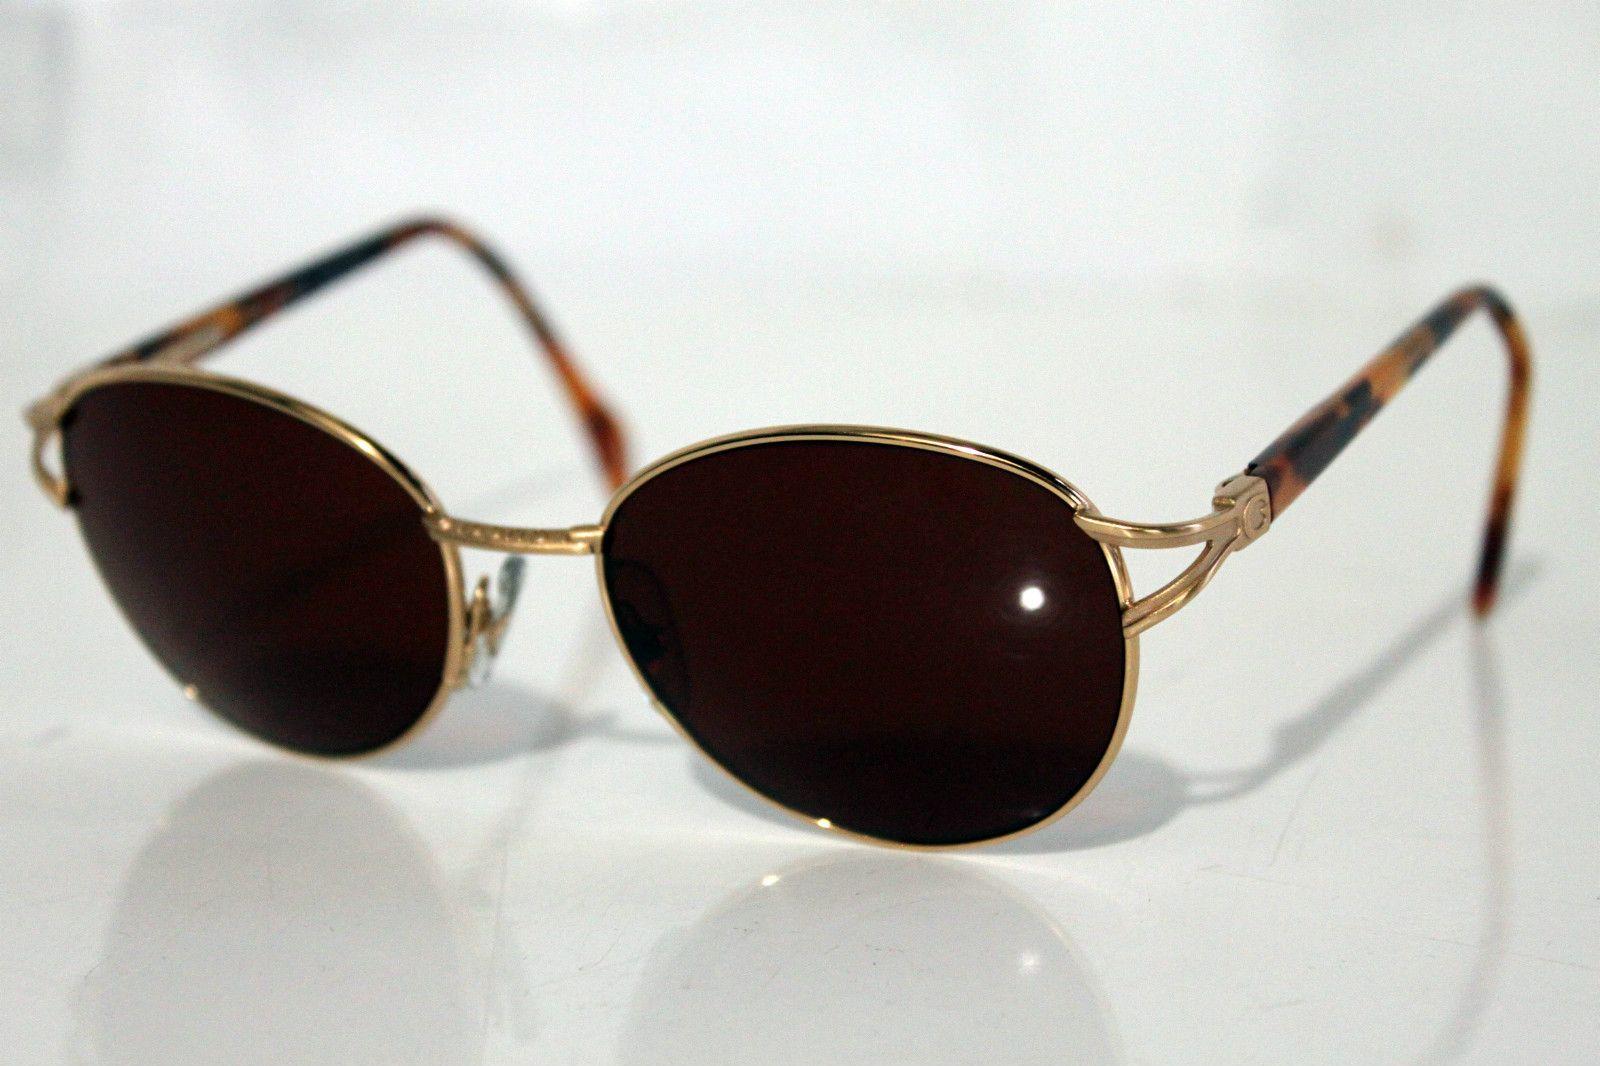 6f3168d69699 GUCCI RARE Designer Sunglasses Mens Womens Retro Vintage Unisex GG 2387/S